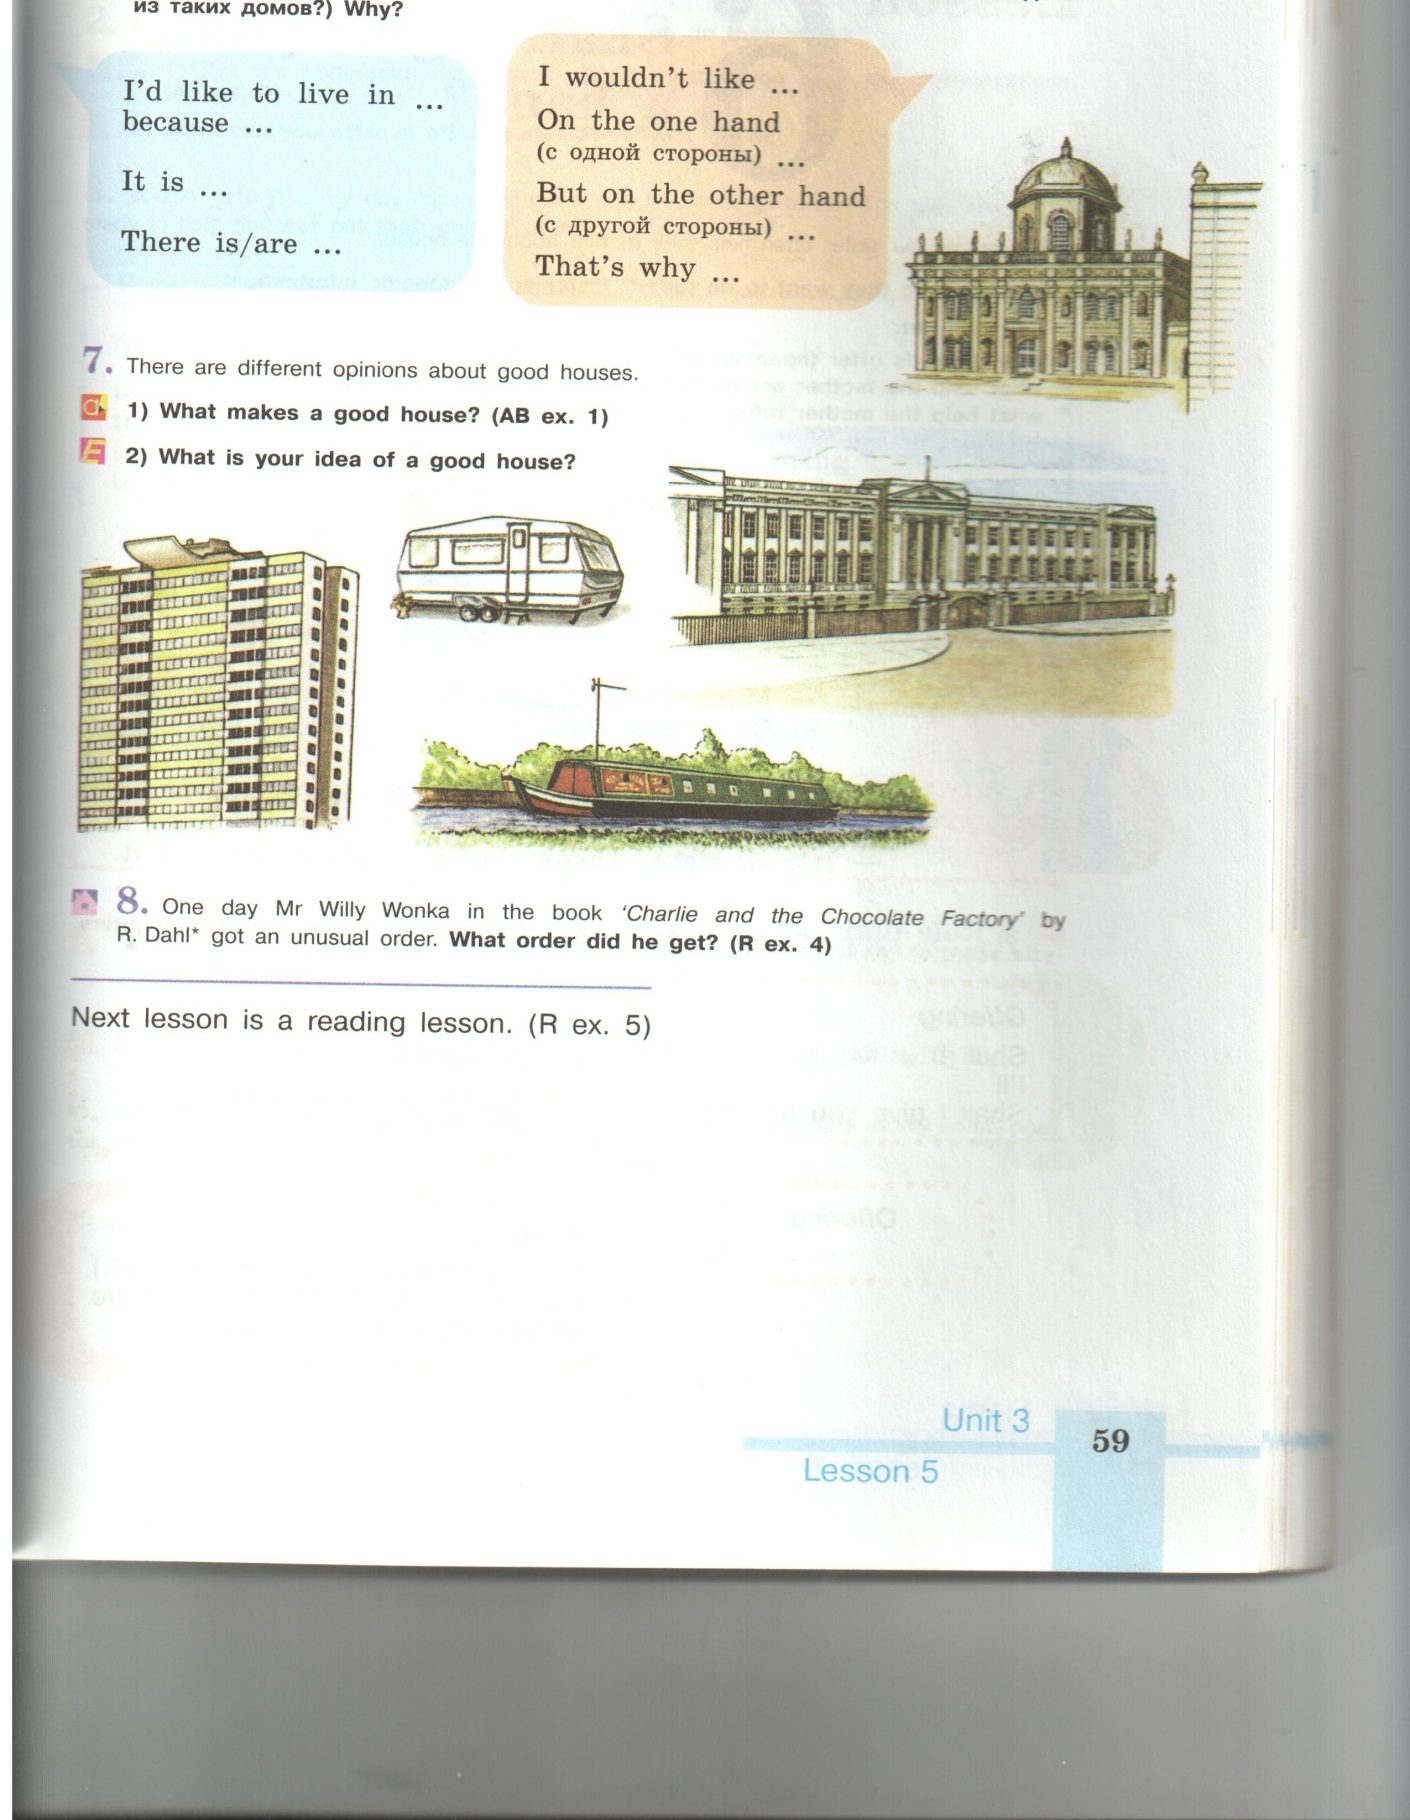 C:\Users\Грузиновская СОШ\Documents\Scanned Documents\Рисунок (401).jpg